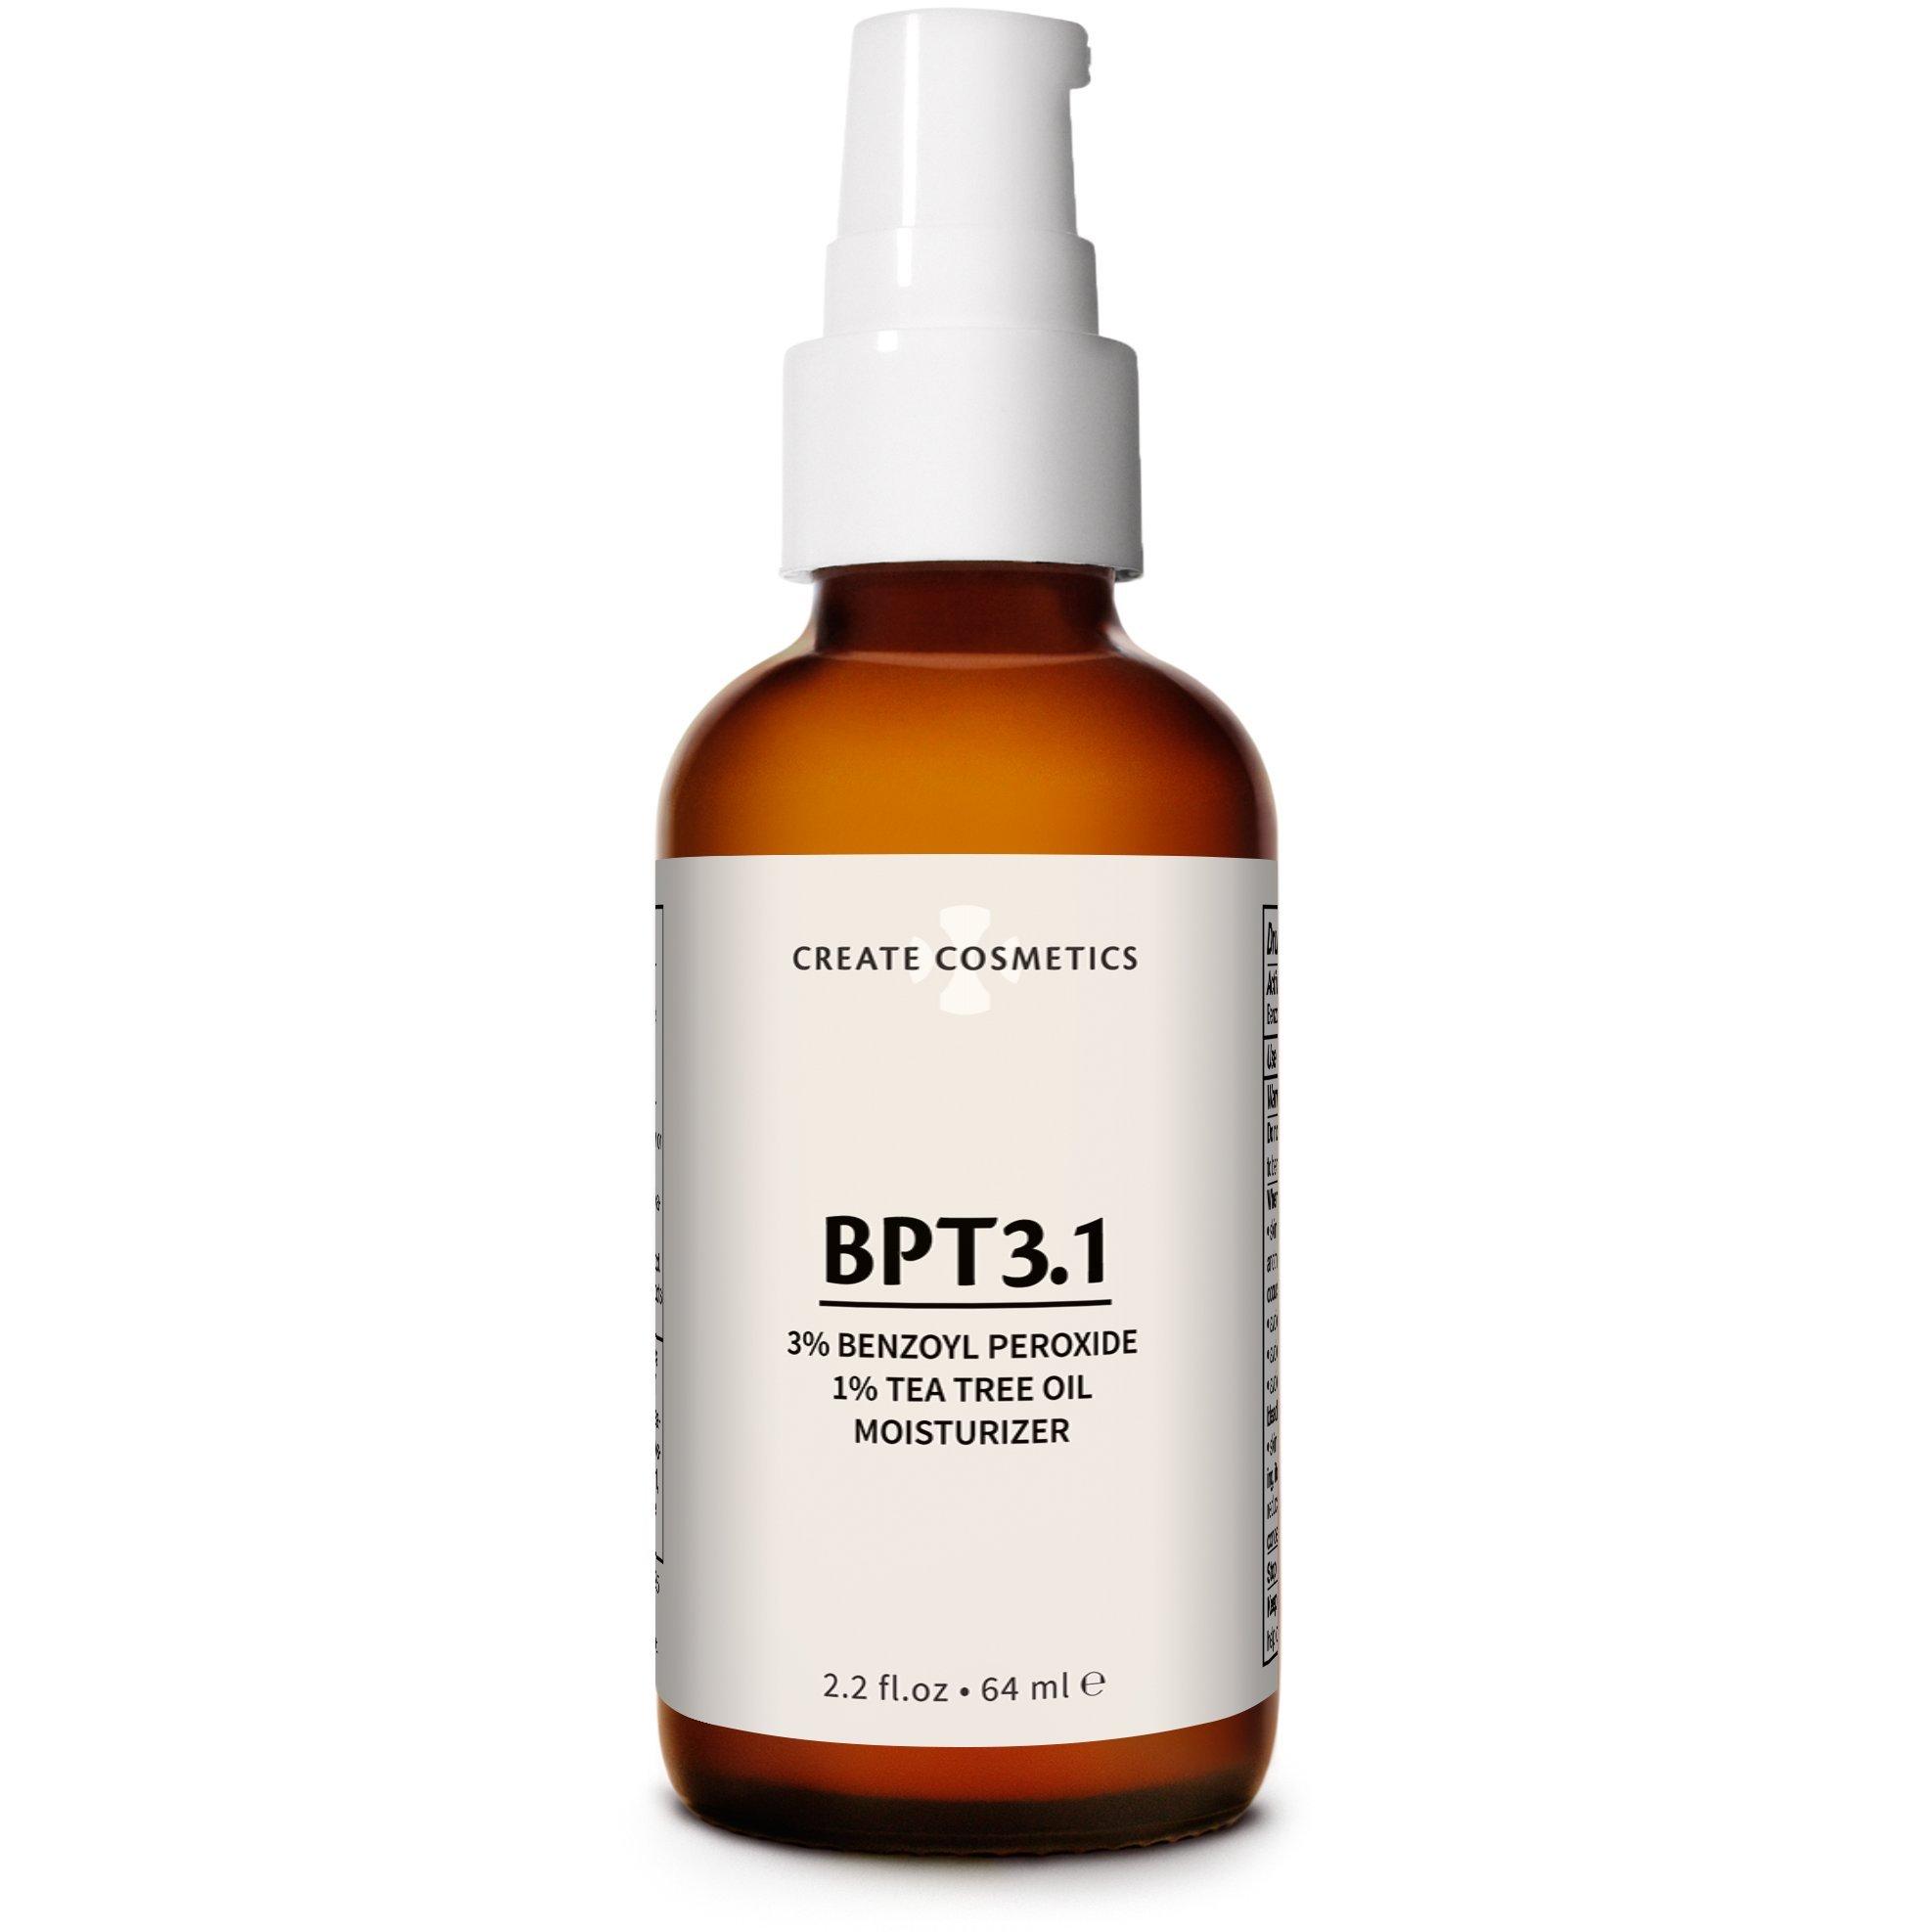 BPT3 Acne Treatment Moisturizer 3% Benzoyl Peroxide 1% Tea Tree Oil Cream 69% Organic Natural Ingredients. Face & Body, Normal & Cystic Acne 2.2 oz